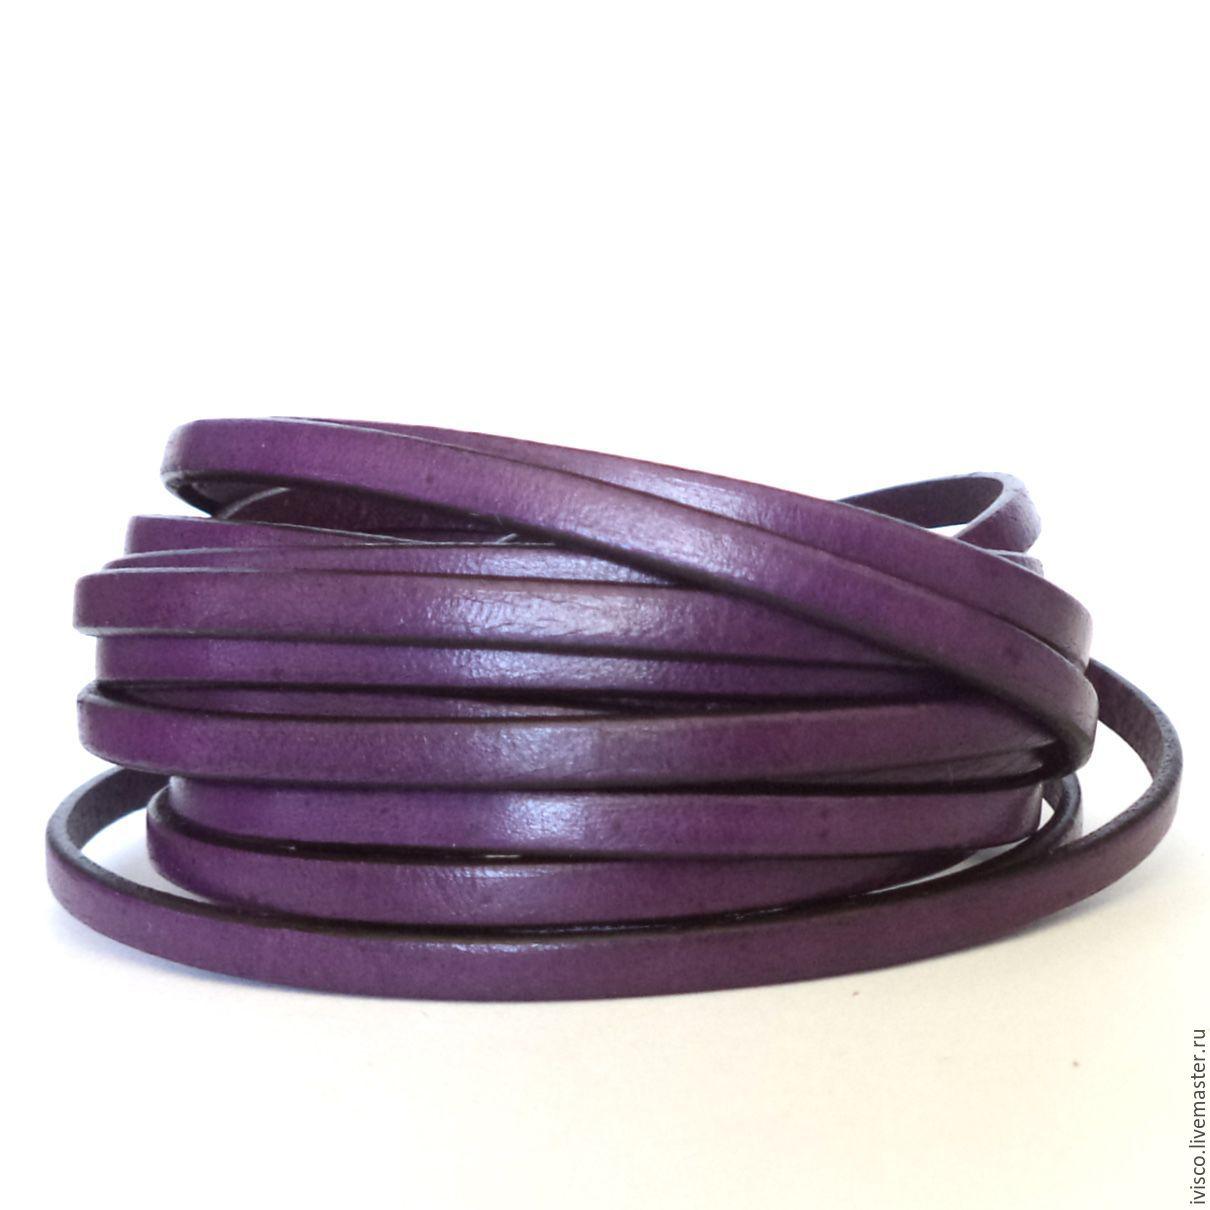 Кожаный шнур 5х2мм темно-фиолетовый матовый, Шнуры, Афины, Фото №1